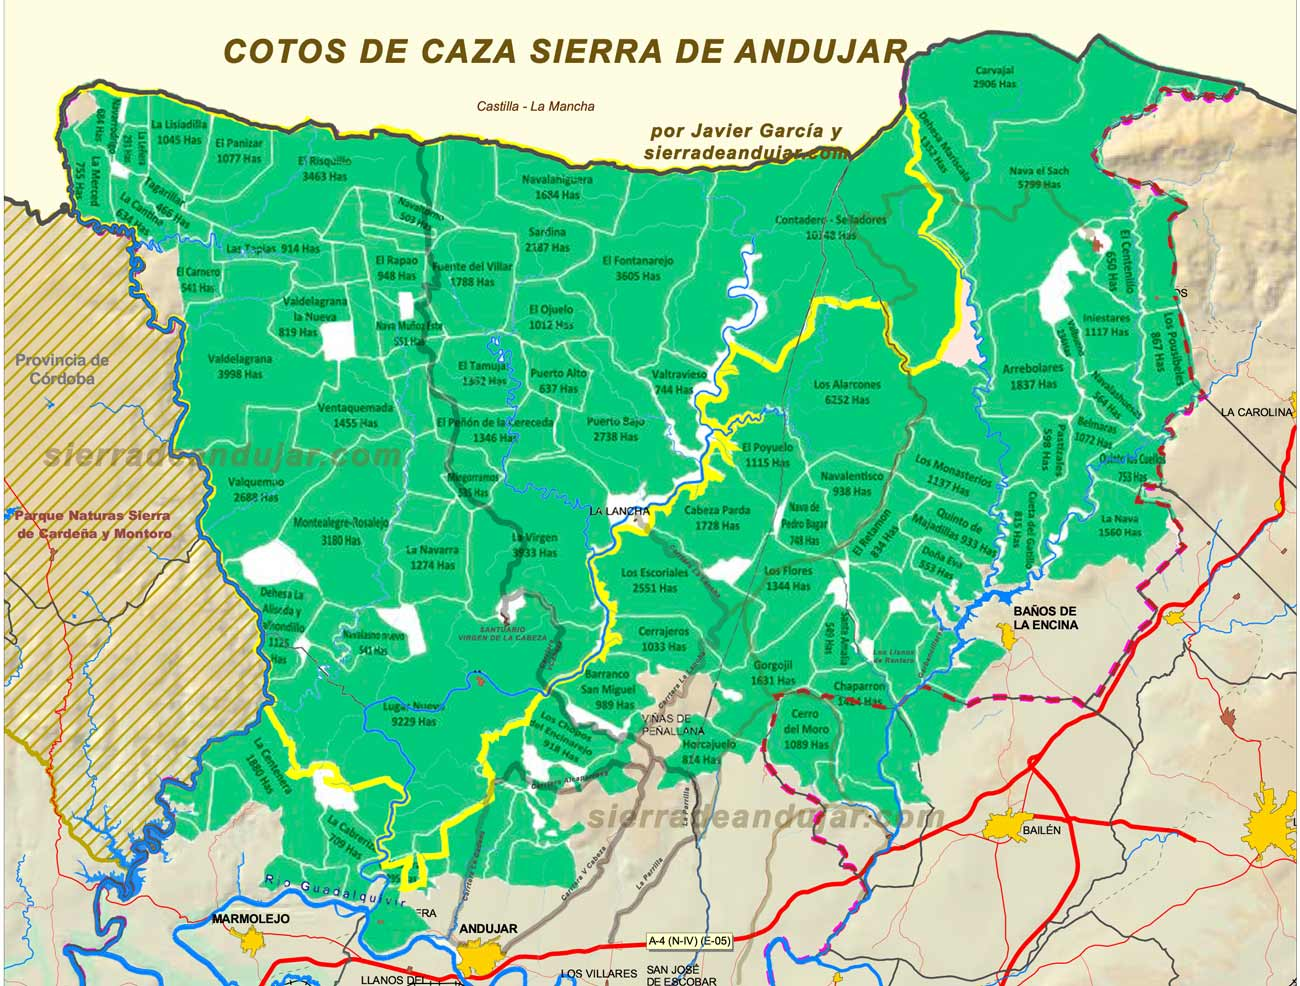 Plano cotos de caza Sierra de Andújar